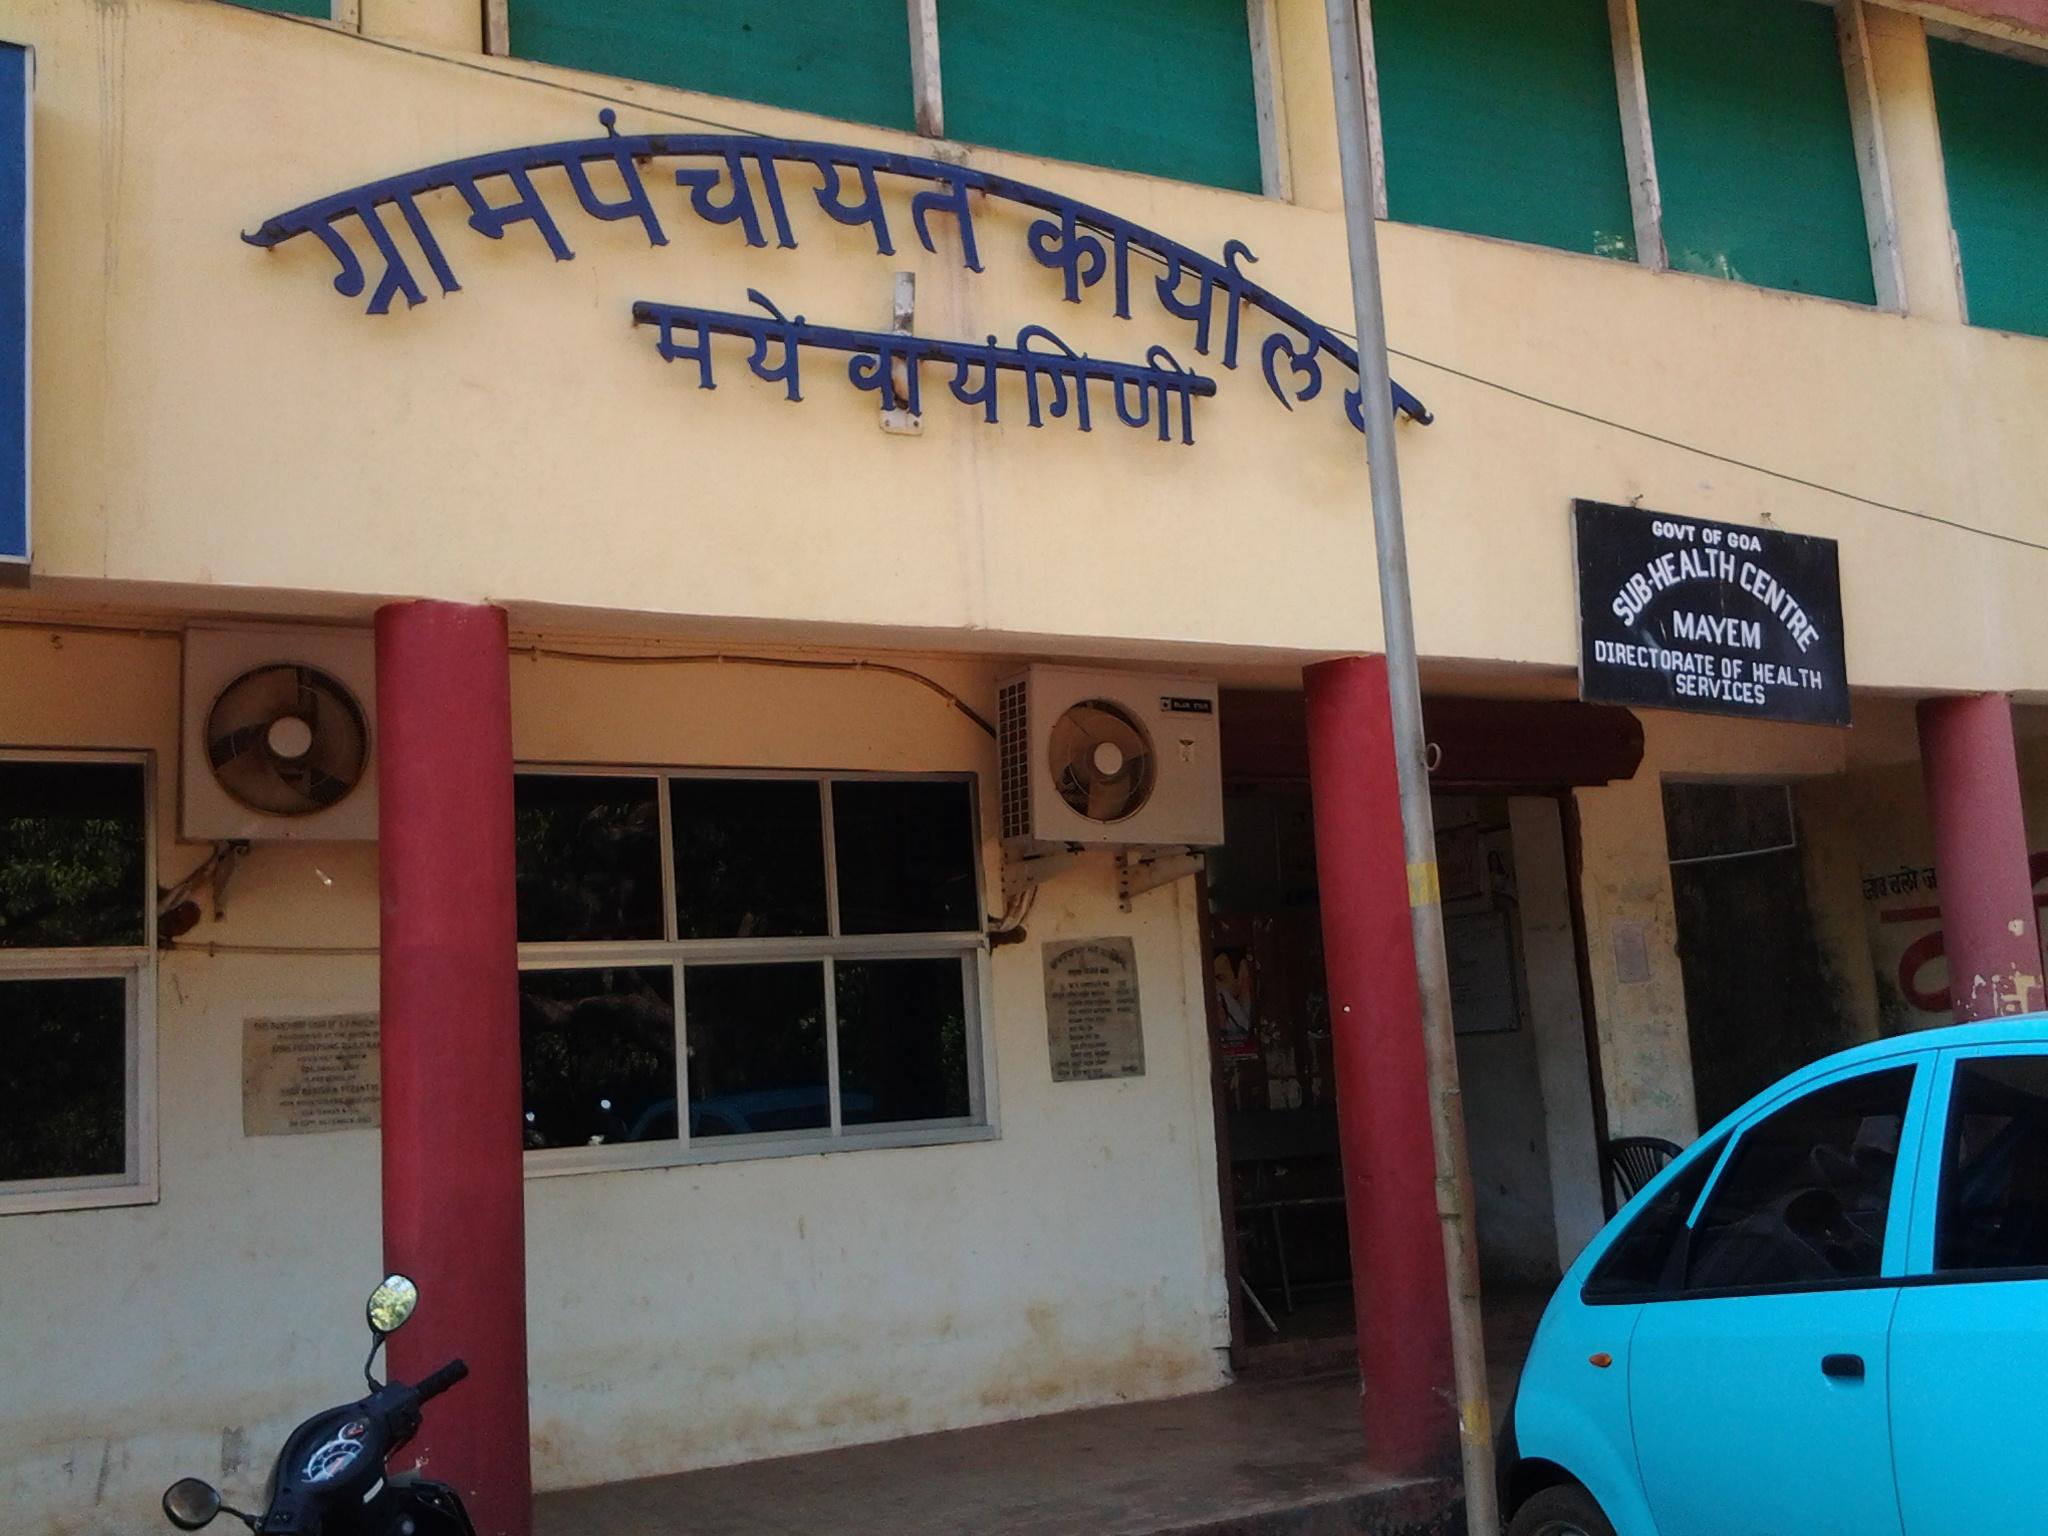 FileGram Panchayat Karyalay Mayemjpg   Wikimedia Commons 2048x1536